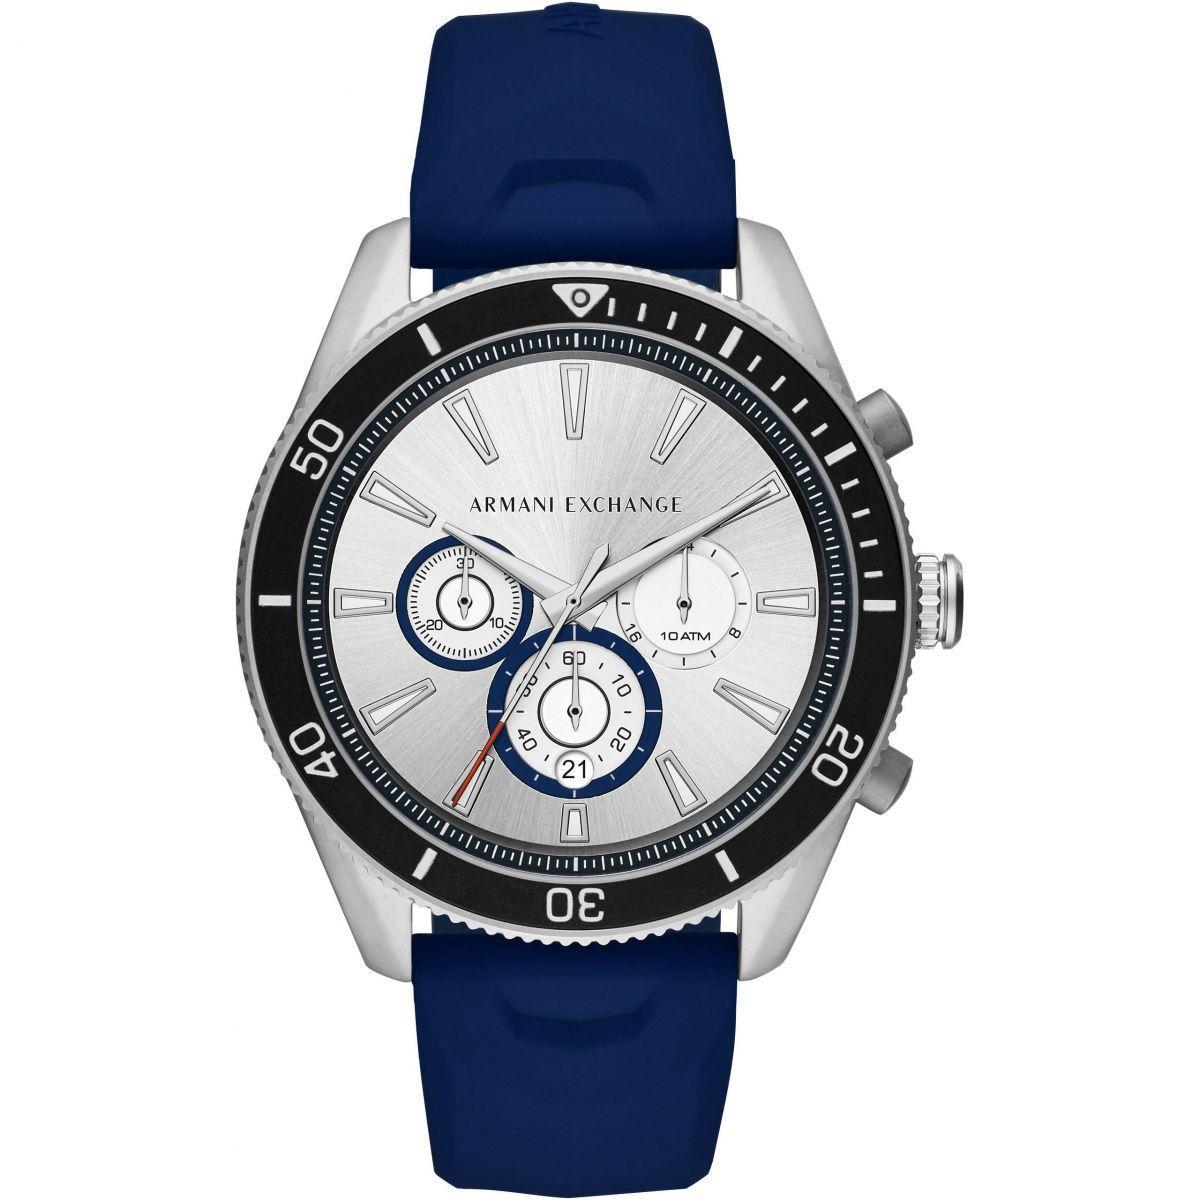 Мужские часы Armani Exchange Enzo Chronograph AX1838